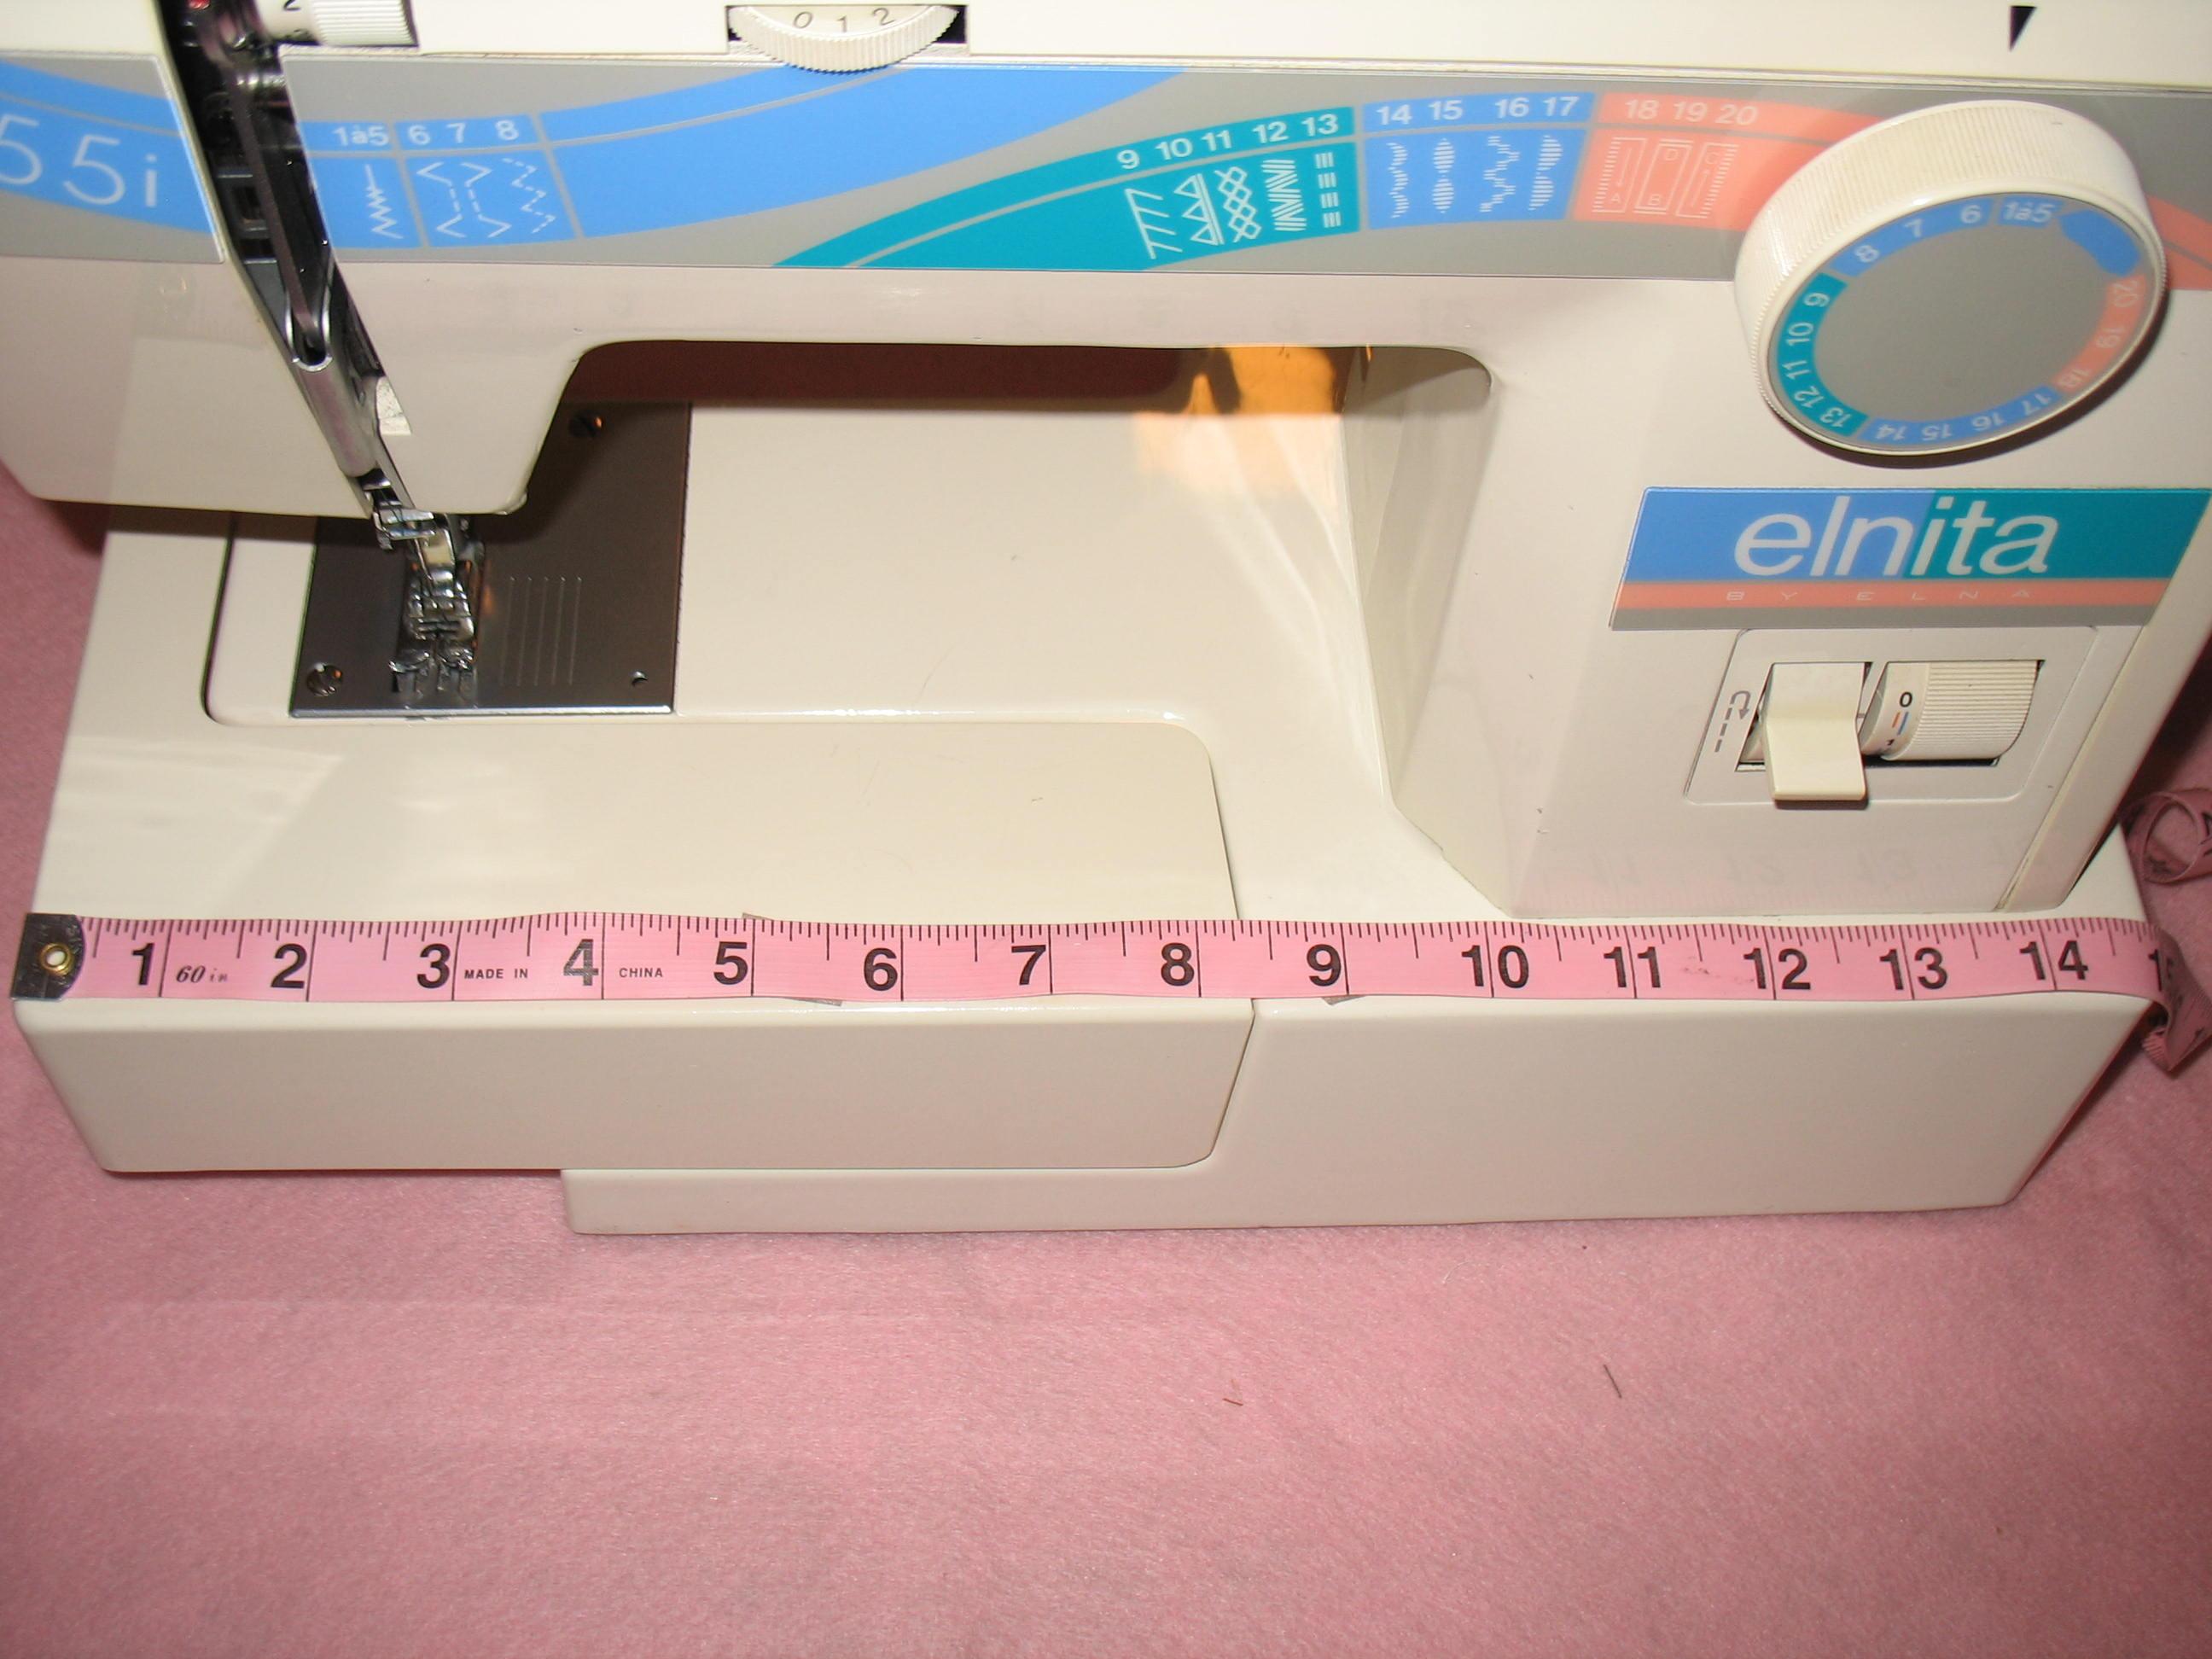 elna elnita 255i sewing machine a review revised 11 17 11 stitch rh stitchnerd wordpress com elnita 200 sewing machine manual elnita 220 sewing machine manual